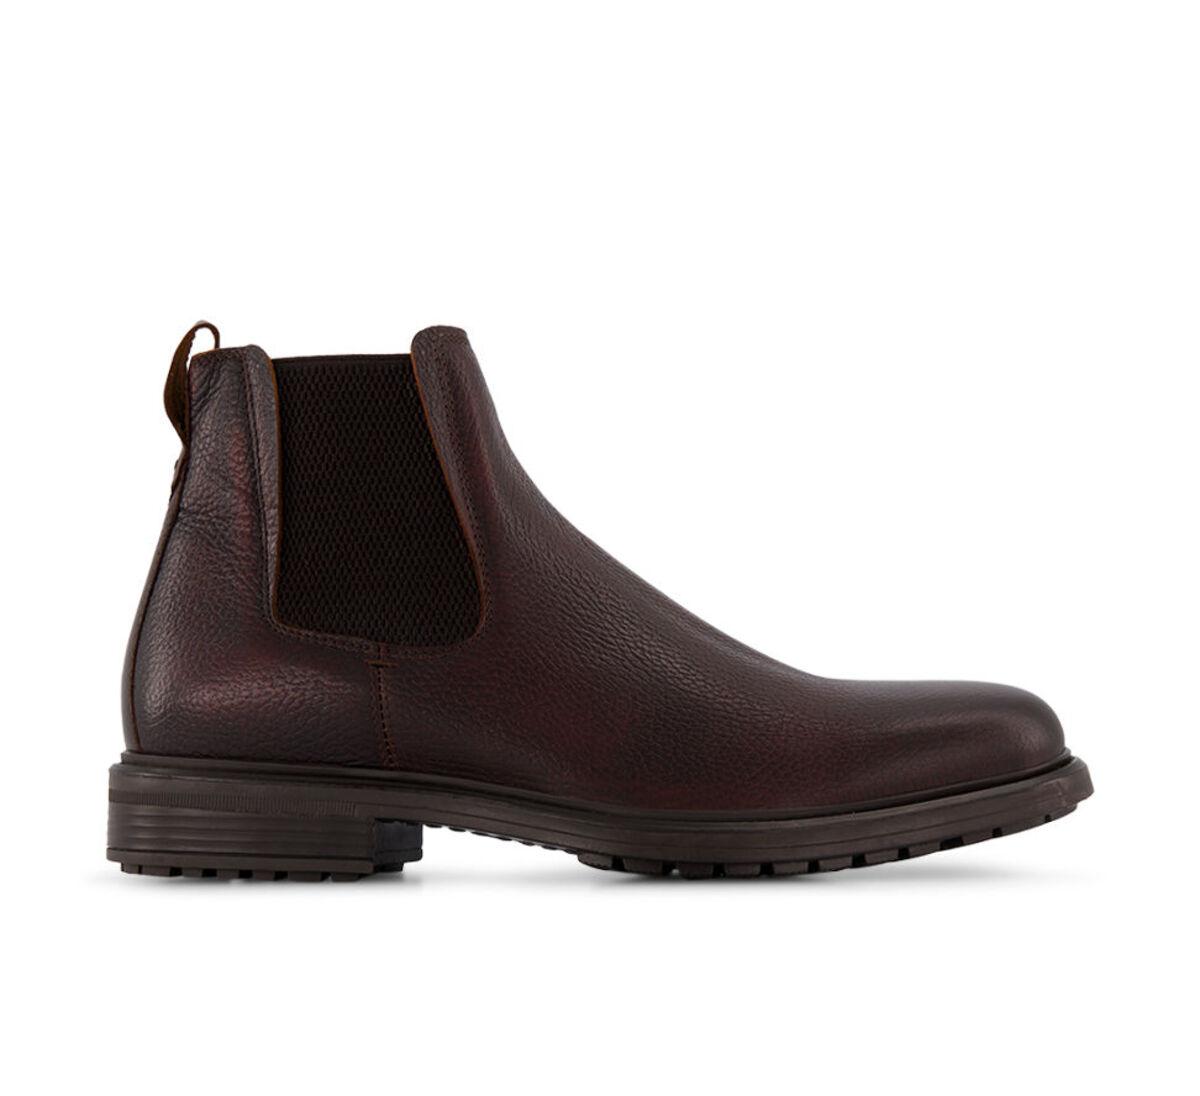 Bild 1 von Varese Chelsea-Boots - ACORES